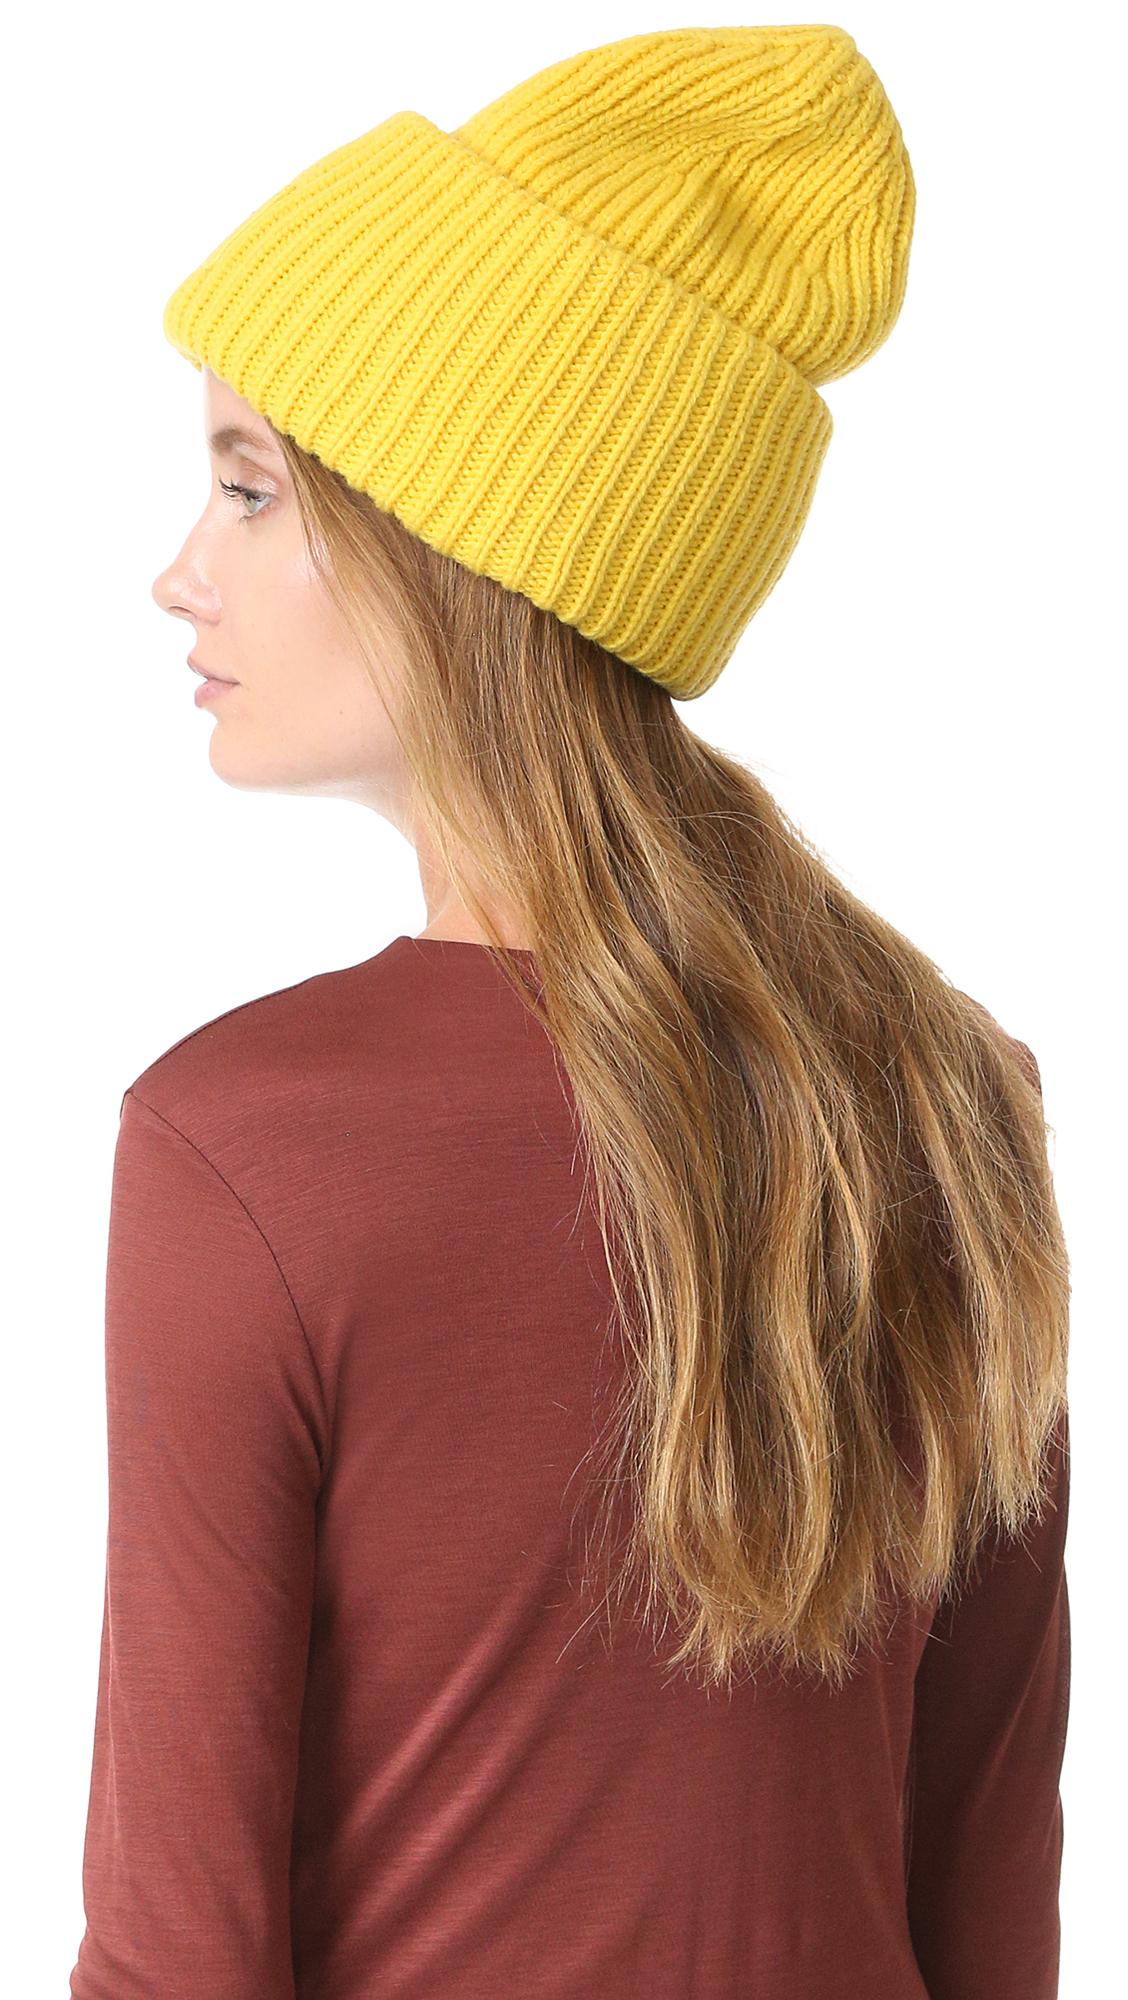 9de11f9a825b acne studios bobble hat - Ecosia